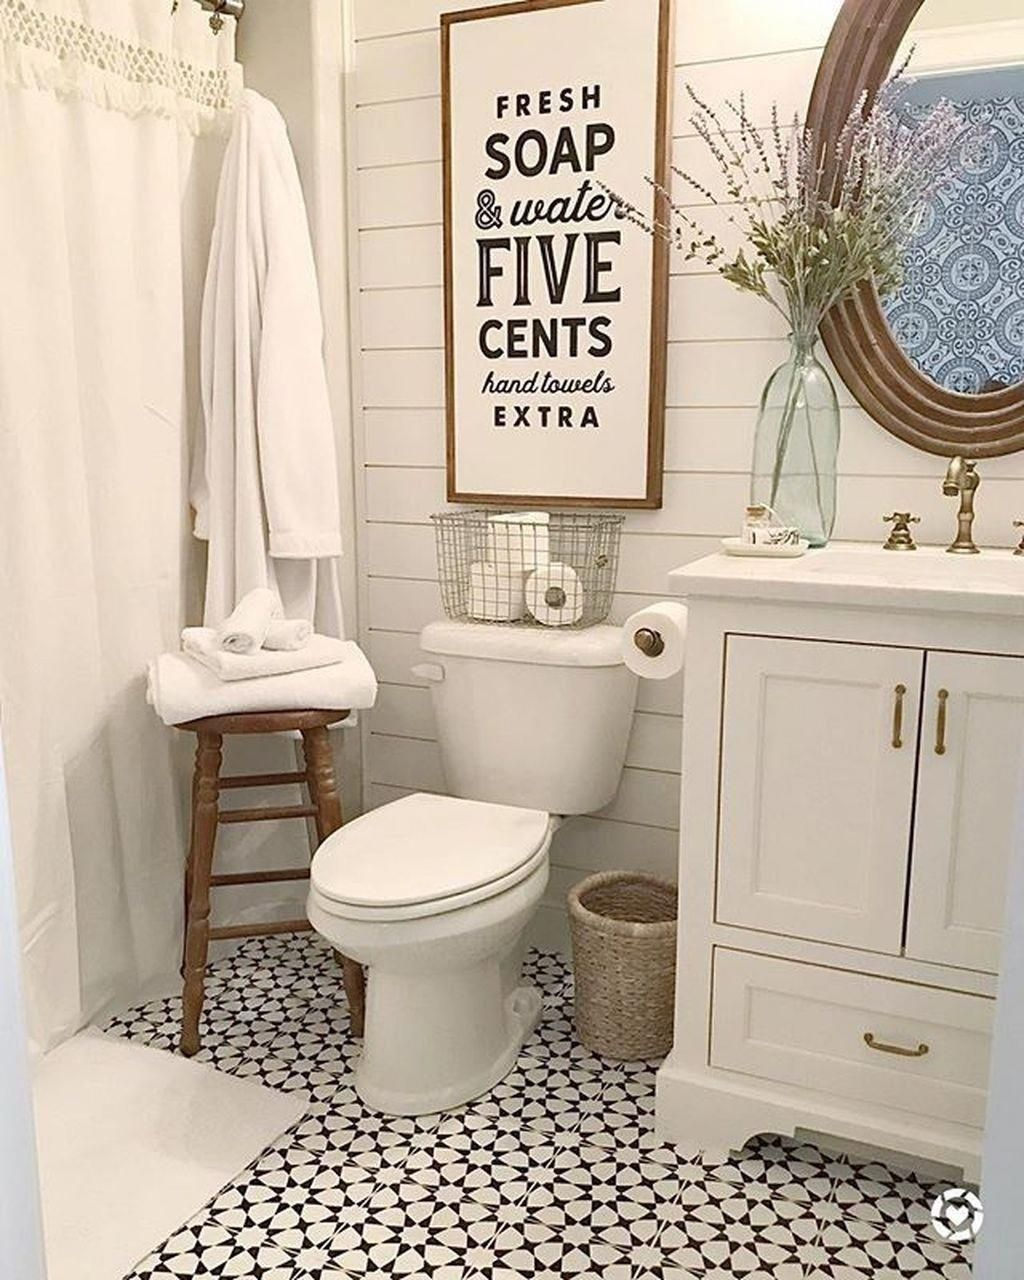 47 Nice Farmhouse Bathroom Remodel Ideas On A Budget - Page 25 of 47 #ModernHomeDecorBathroom,